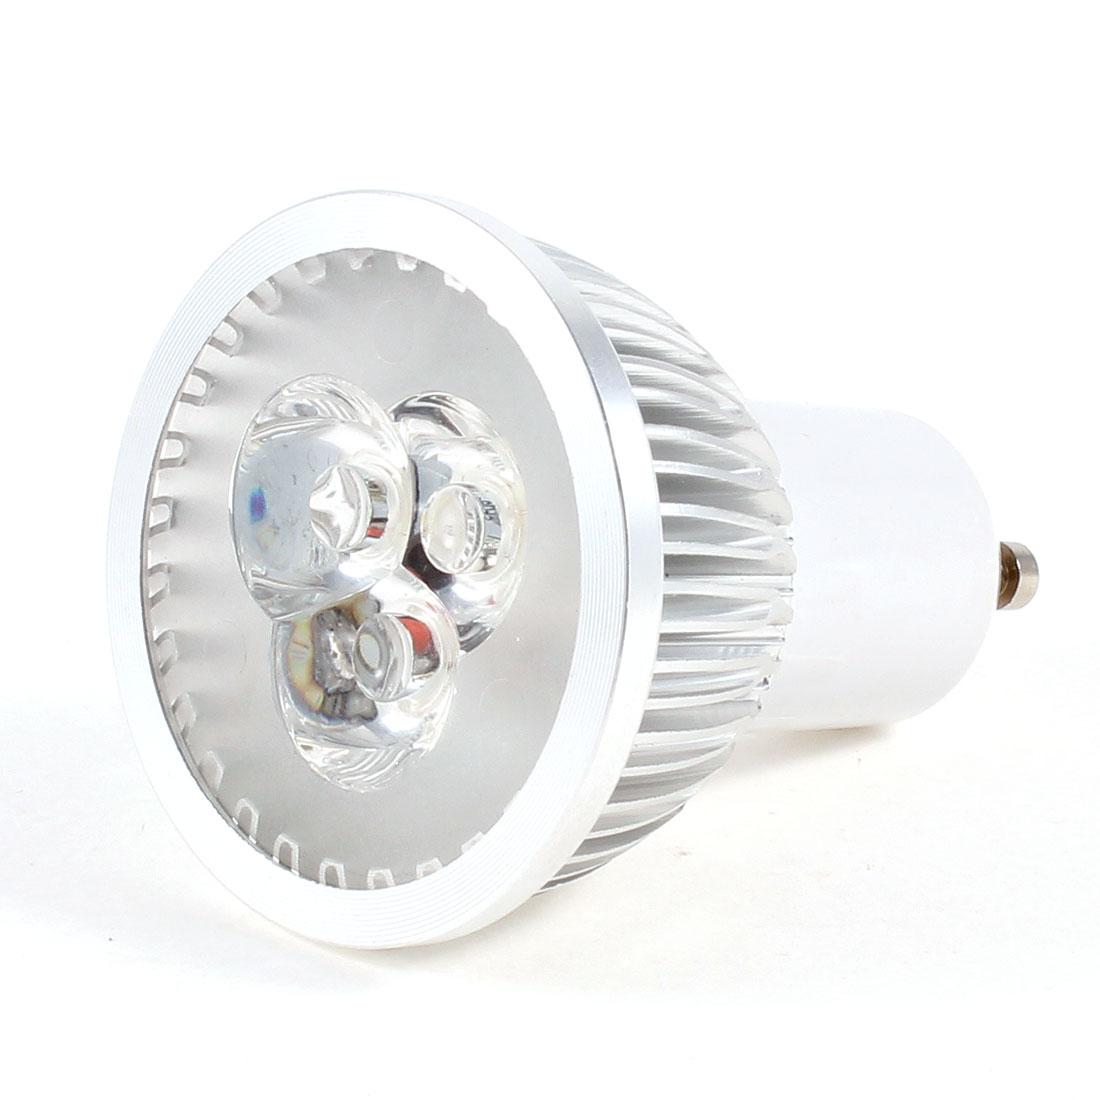 220VAC 3W 3 LED White Light Lamp Energy Saving GU10 Spotlight Bulb